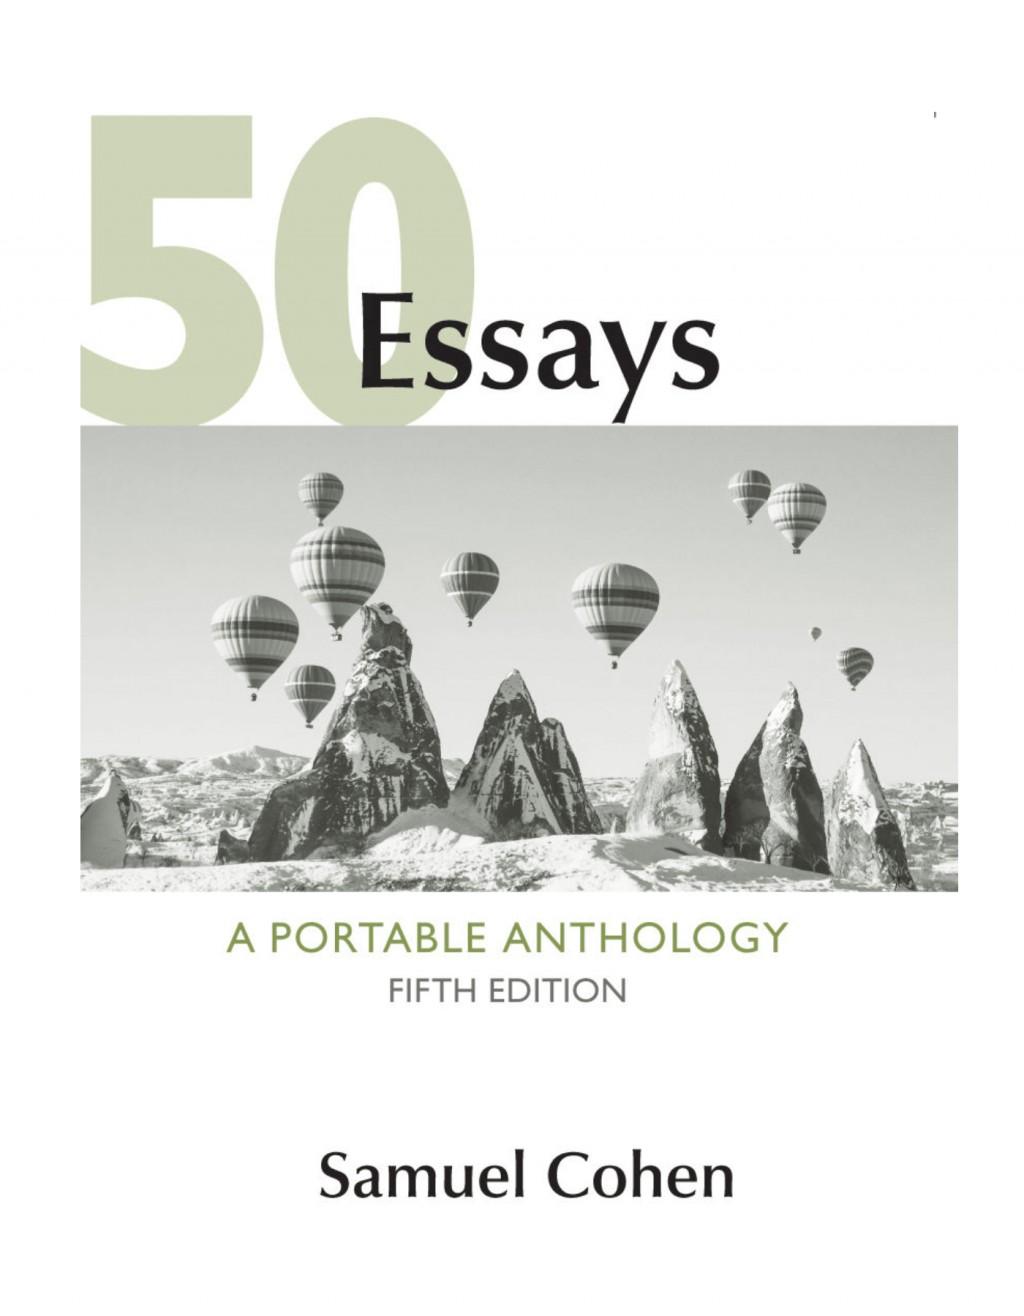 006 50fit14002c1800ssl1 Essays Portable Anthology 5th Edition Pdf Essay Fascinating 50 A Large